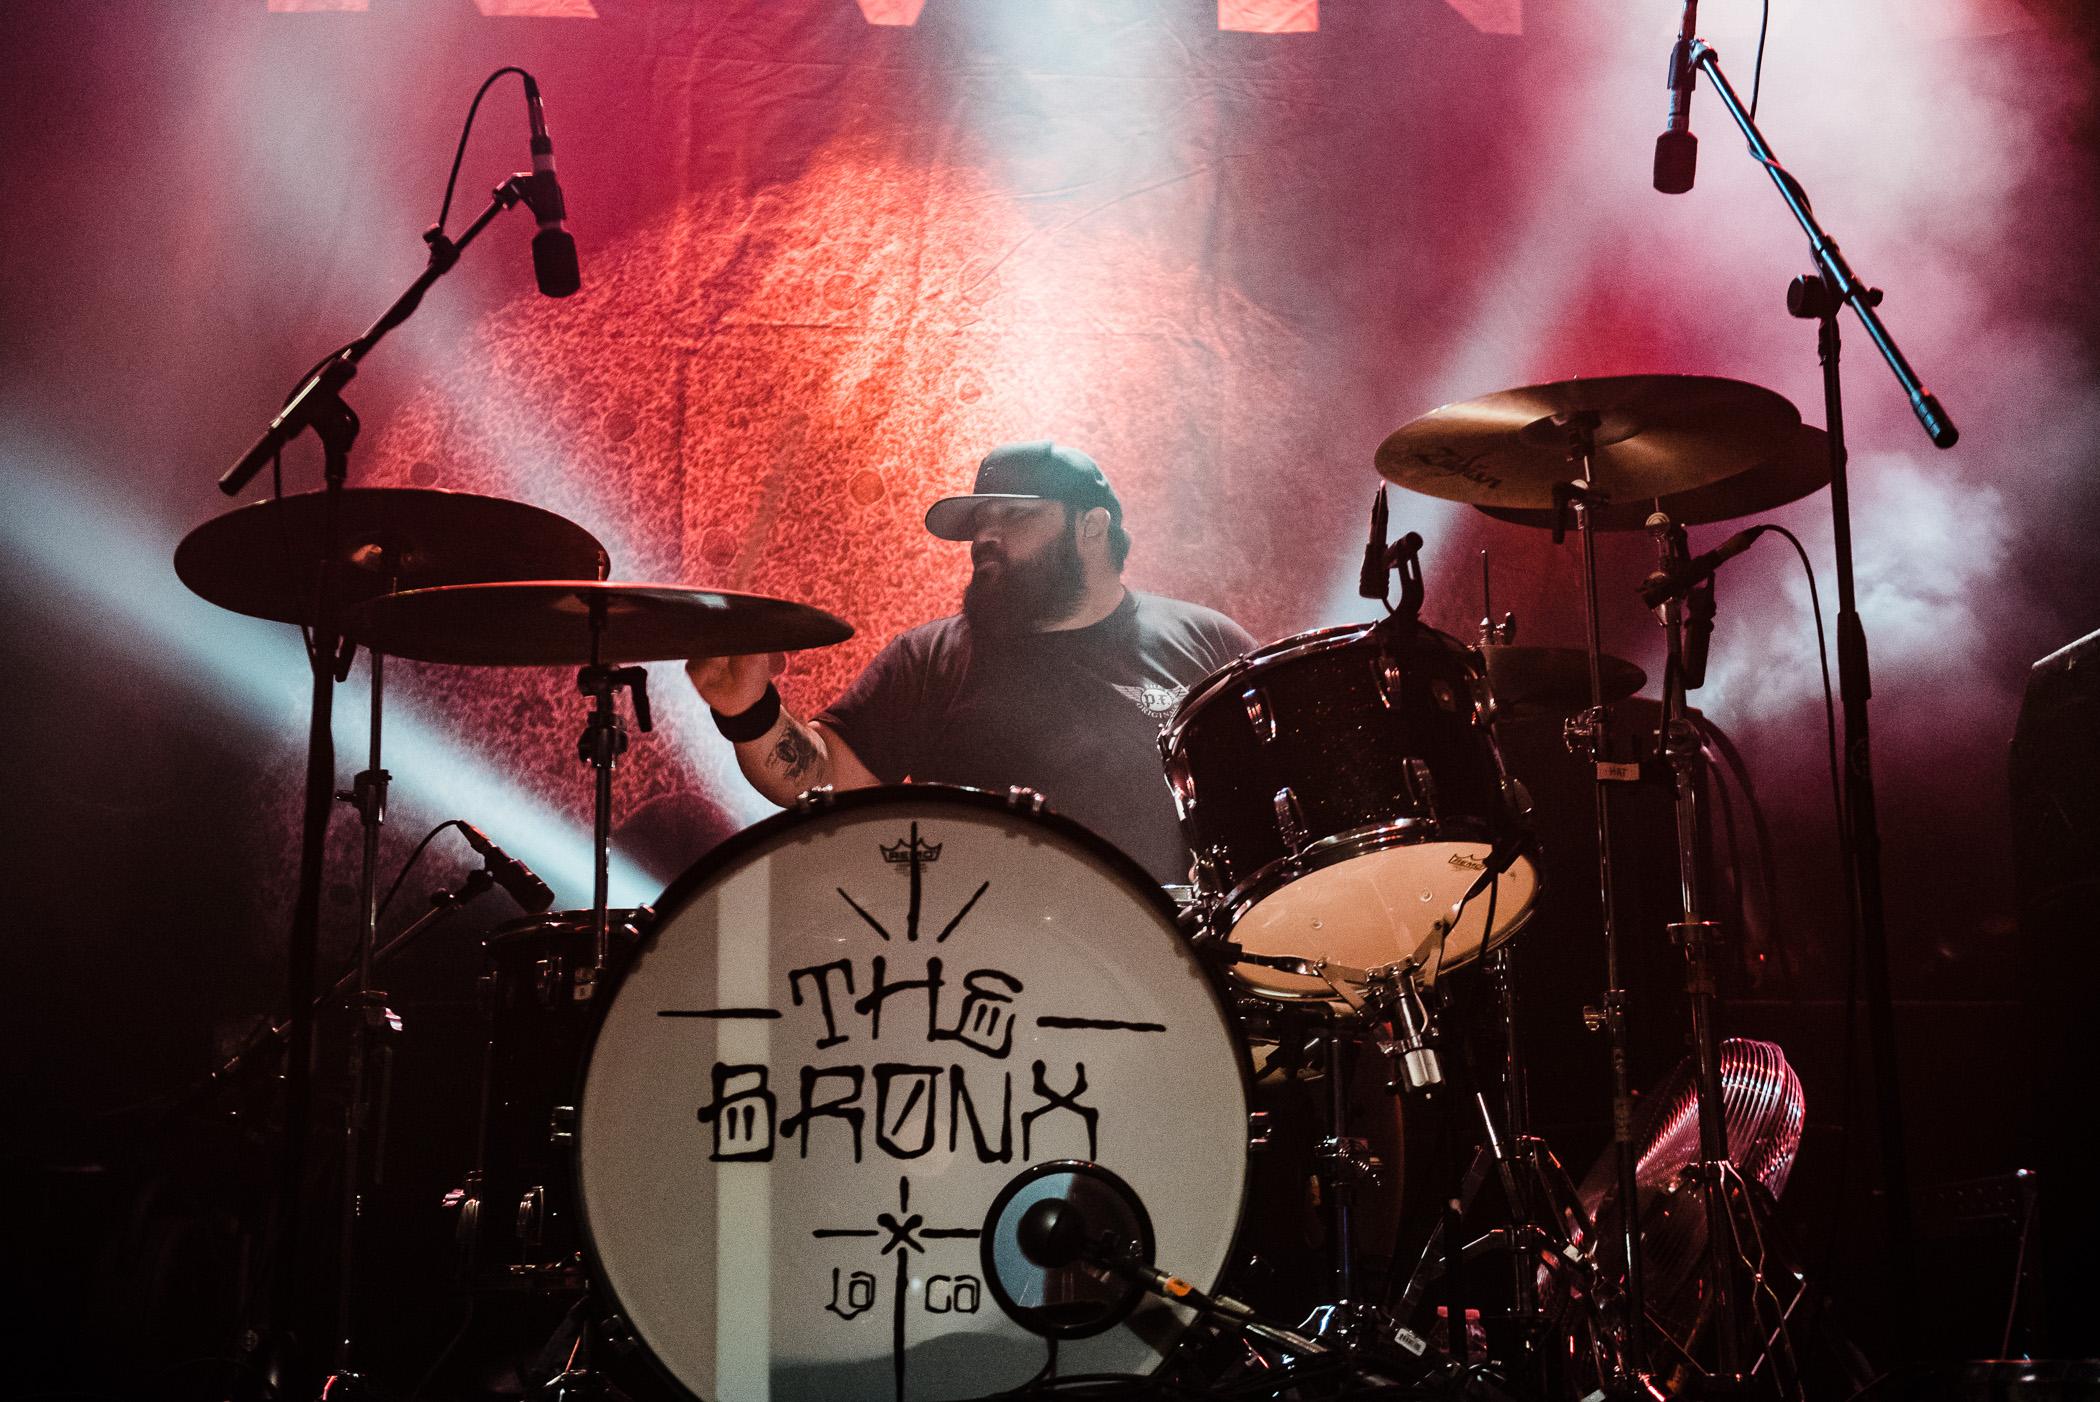 1_The_Bronx-Rickshaw_Theatre-Vancouver_Timothy_Nguyen-20180402 (37 of 52).jpg